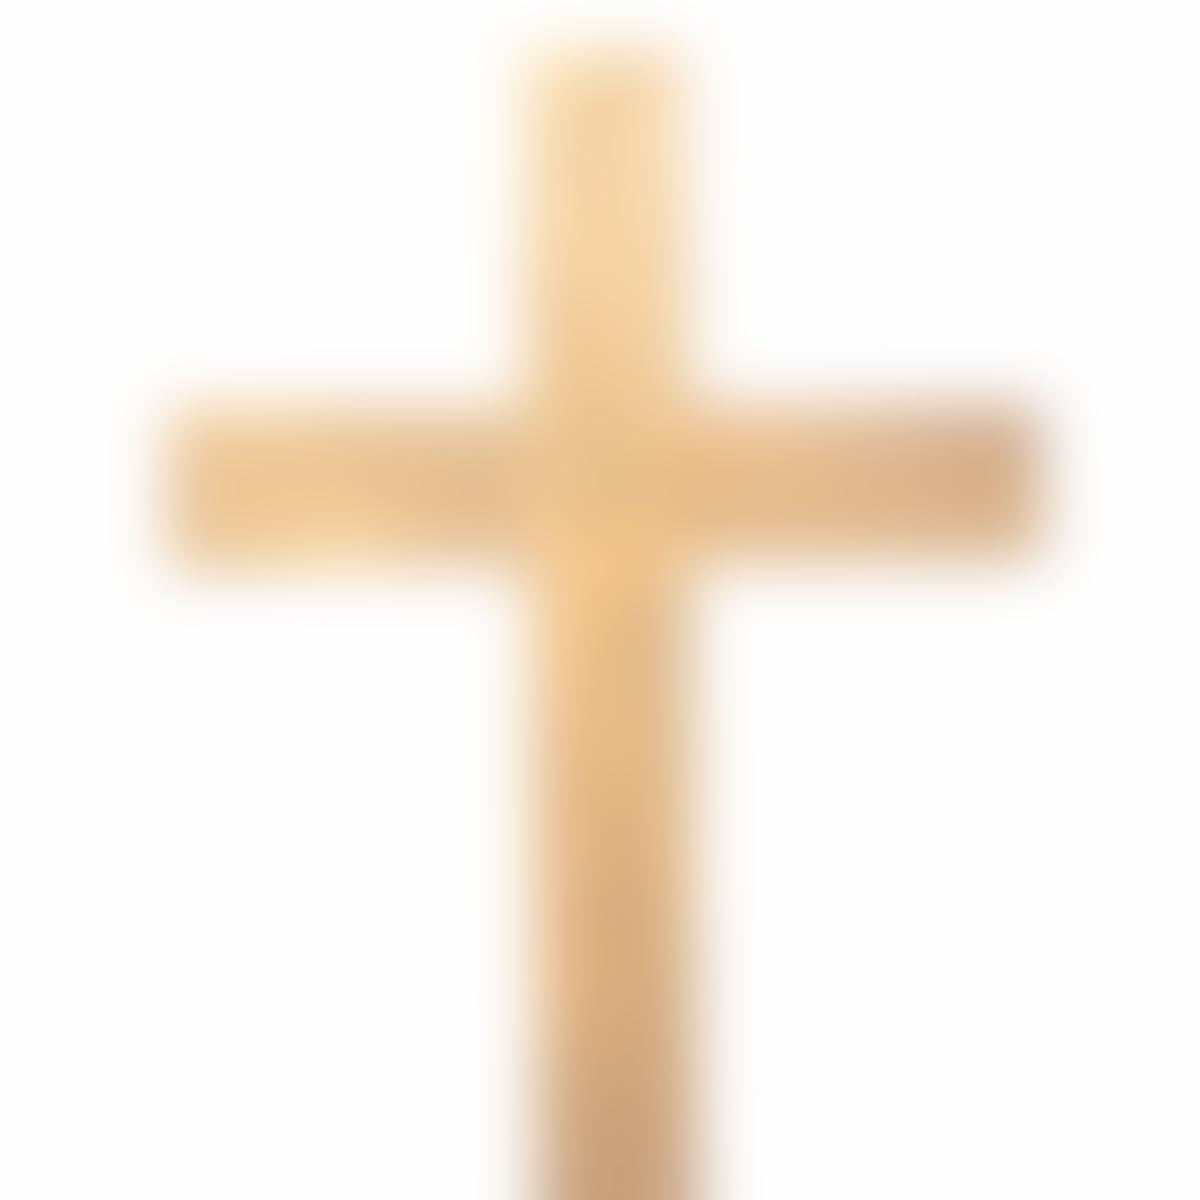 Amazon.com: Handmade Wall Cross Wooden Catholic Wall Crucifix - Home ...